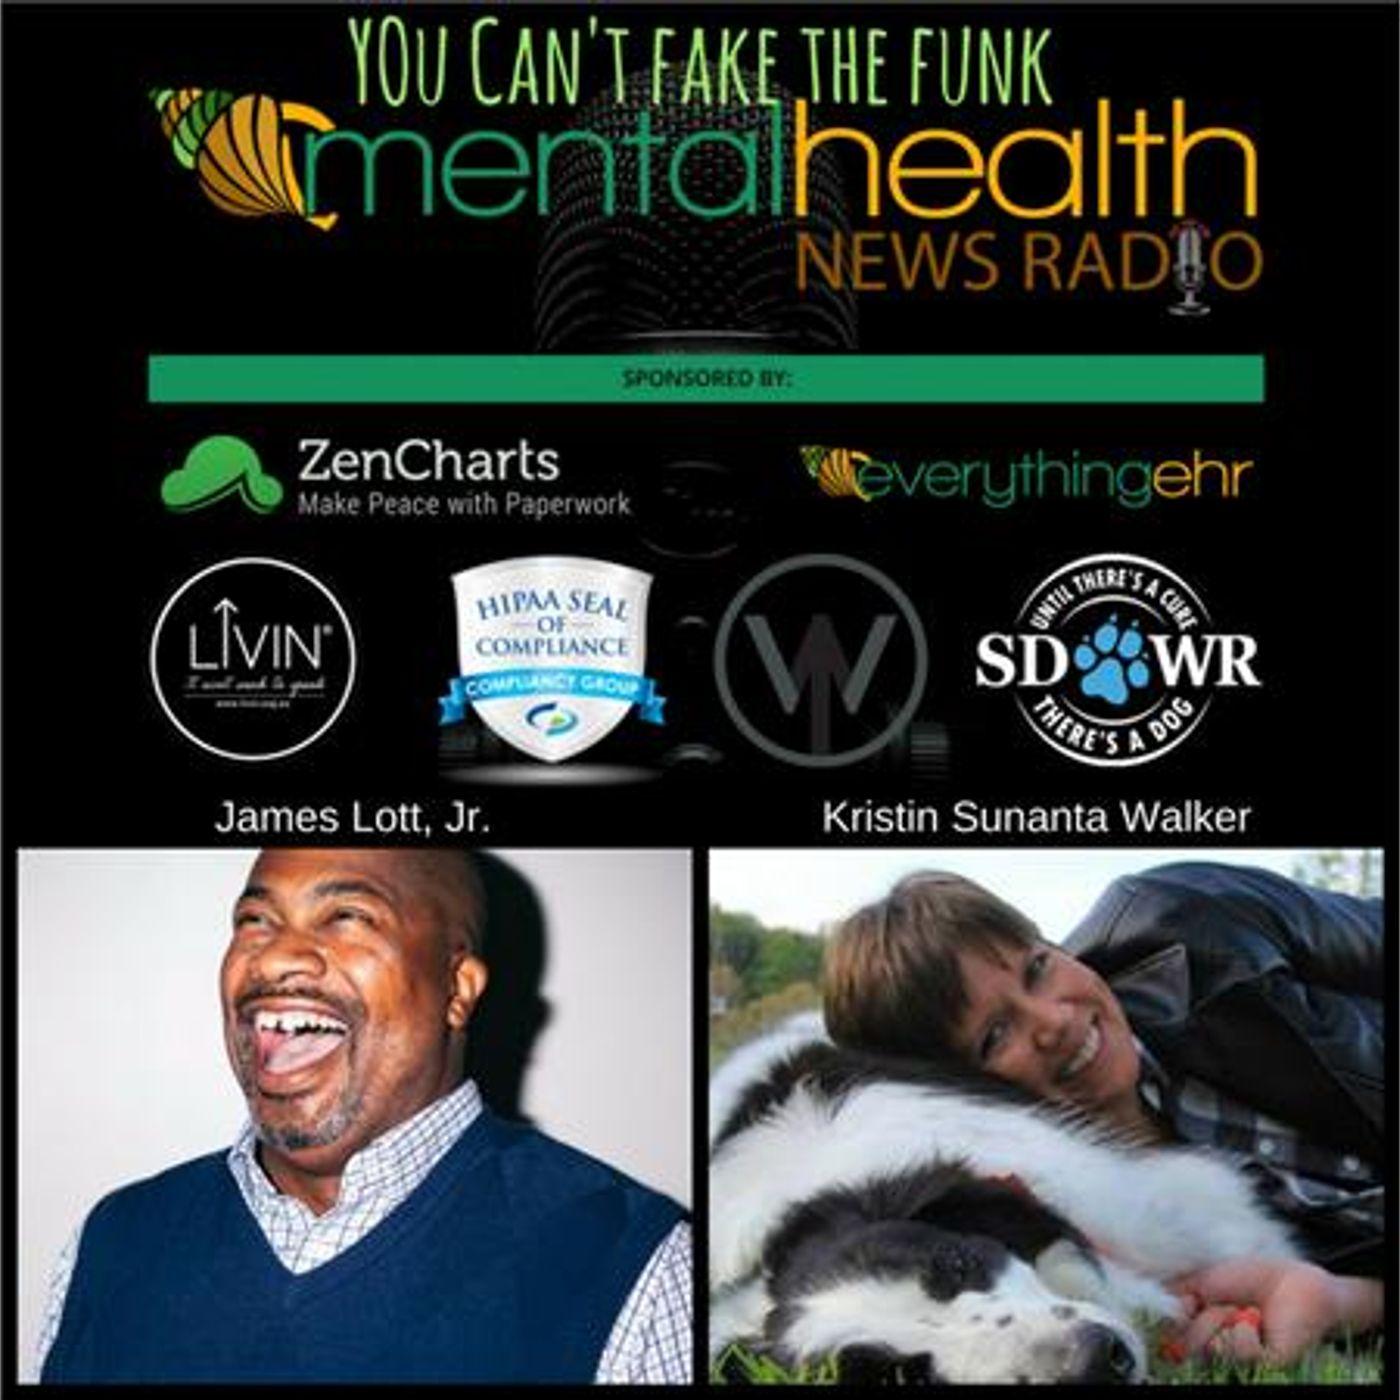 Mental Health News Radio - You Can't Fake the Funk: James Lott, Jr. and Kristin Sunanta Walker